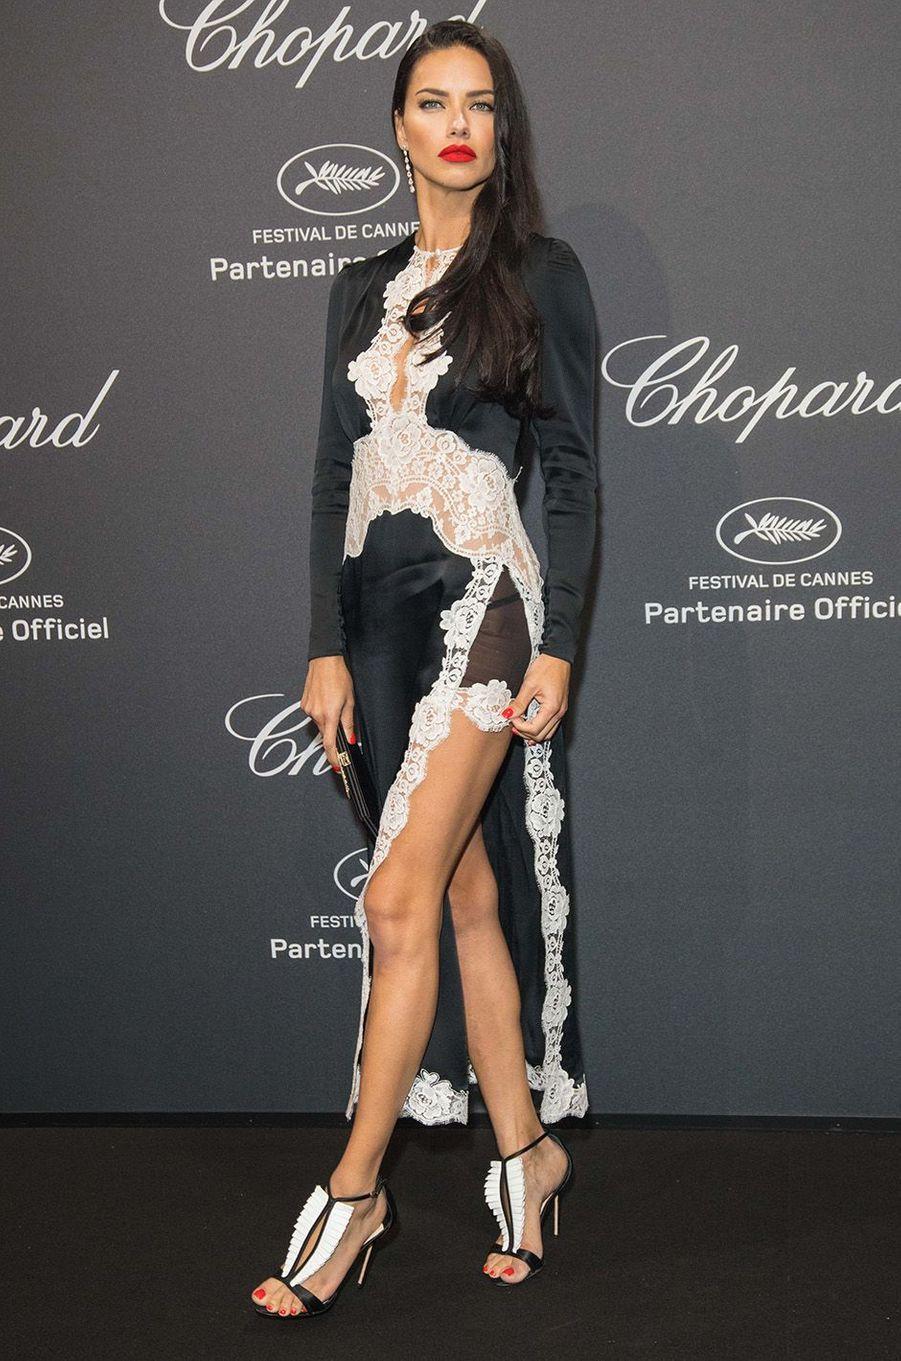 Adrianna Lima au gala Chopard, à Cannes, le 16 mai 2016.